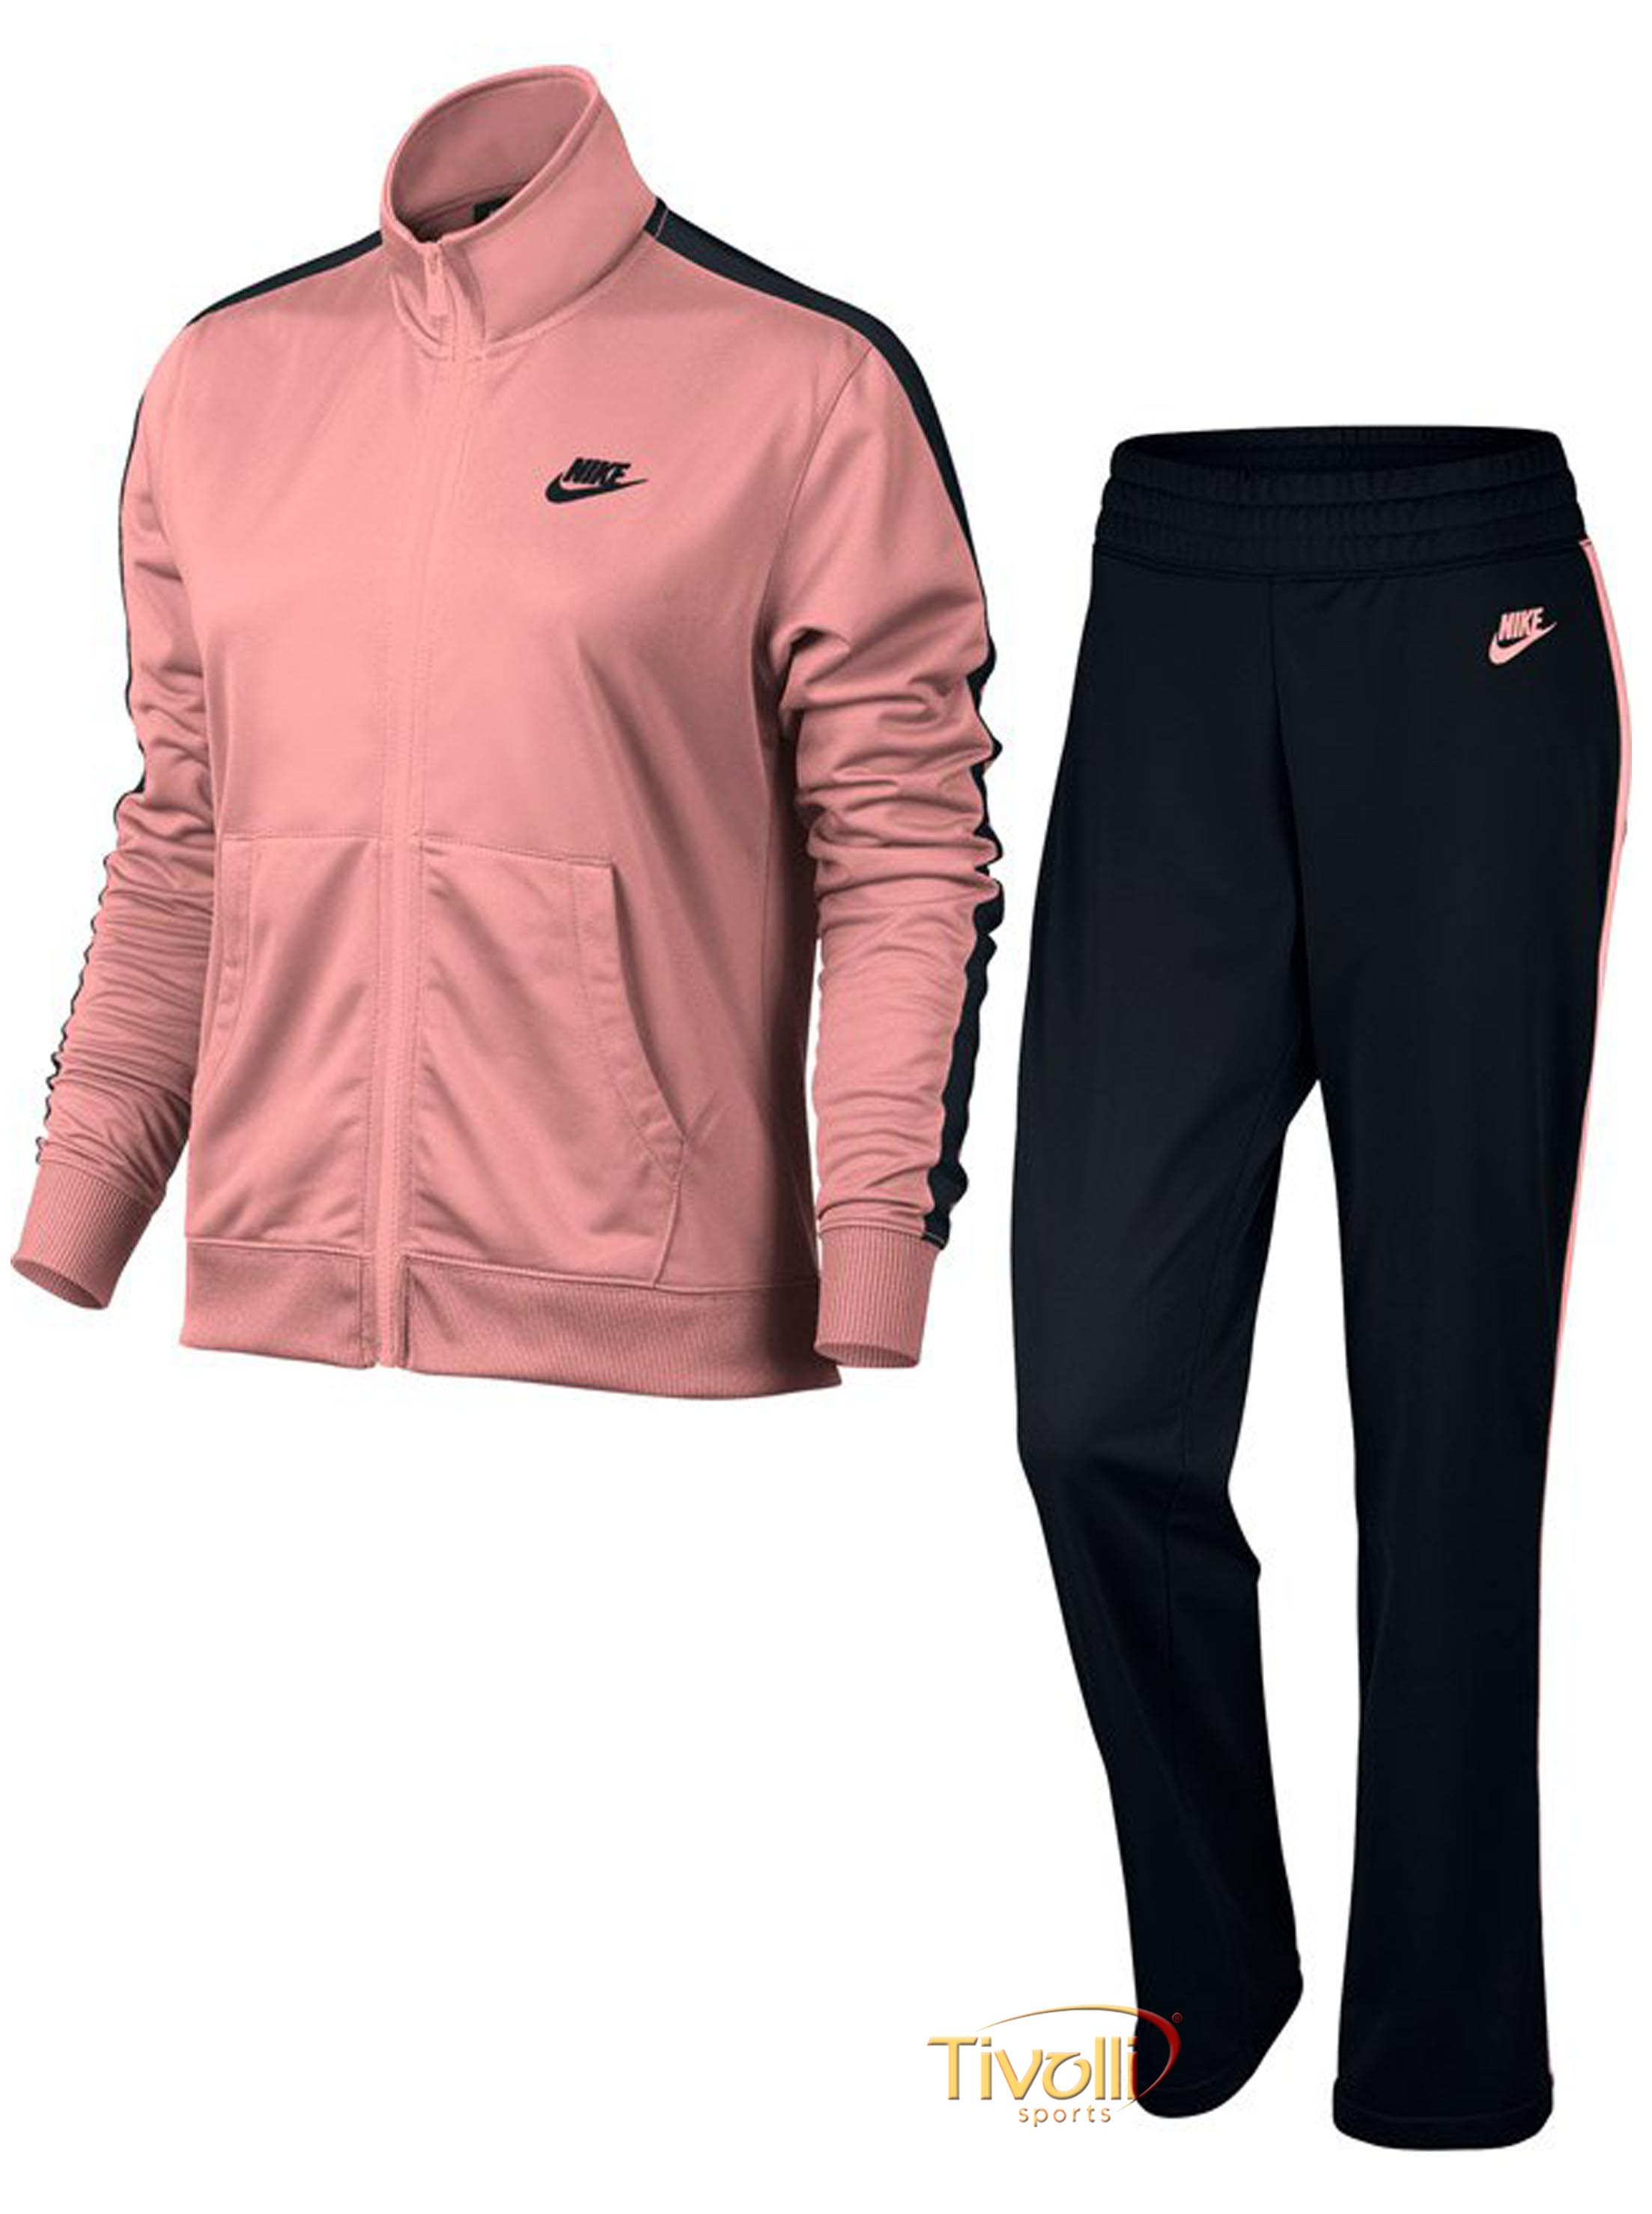 7244a0b3290 Raquete Mania   Agasalho Nike   Sportswear Track Suit Rosa e Preto